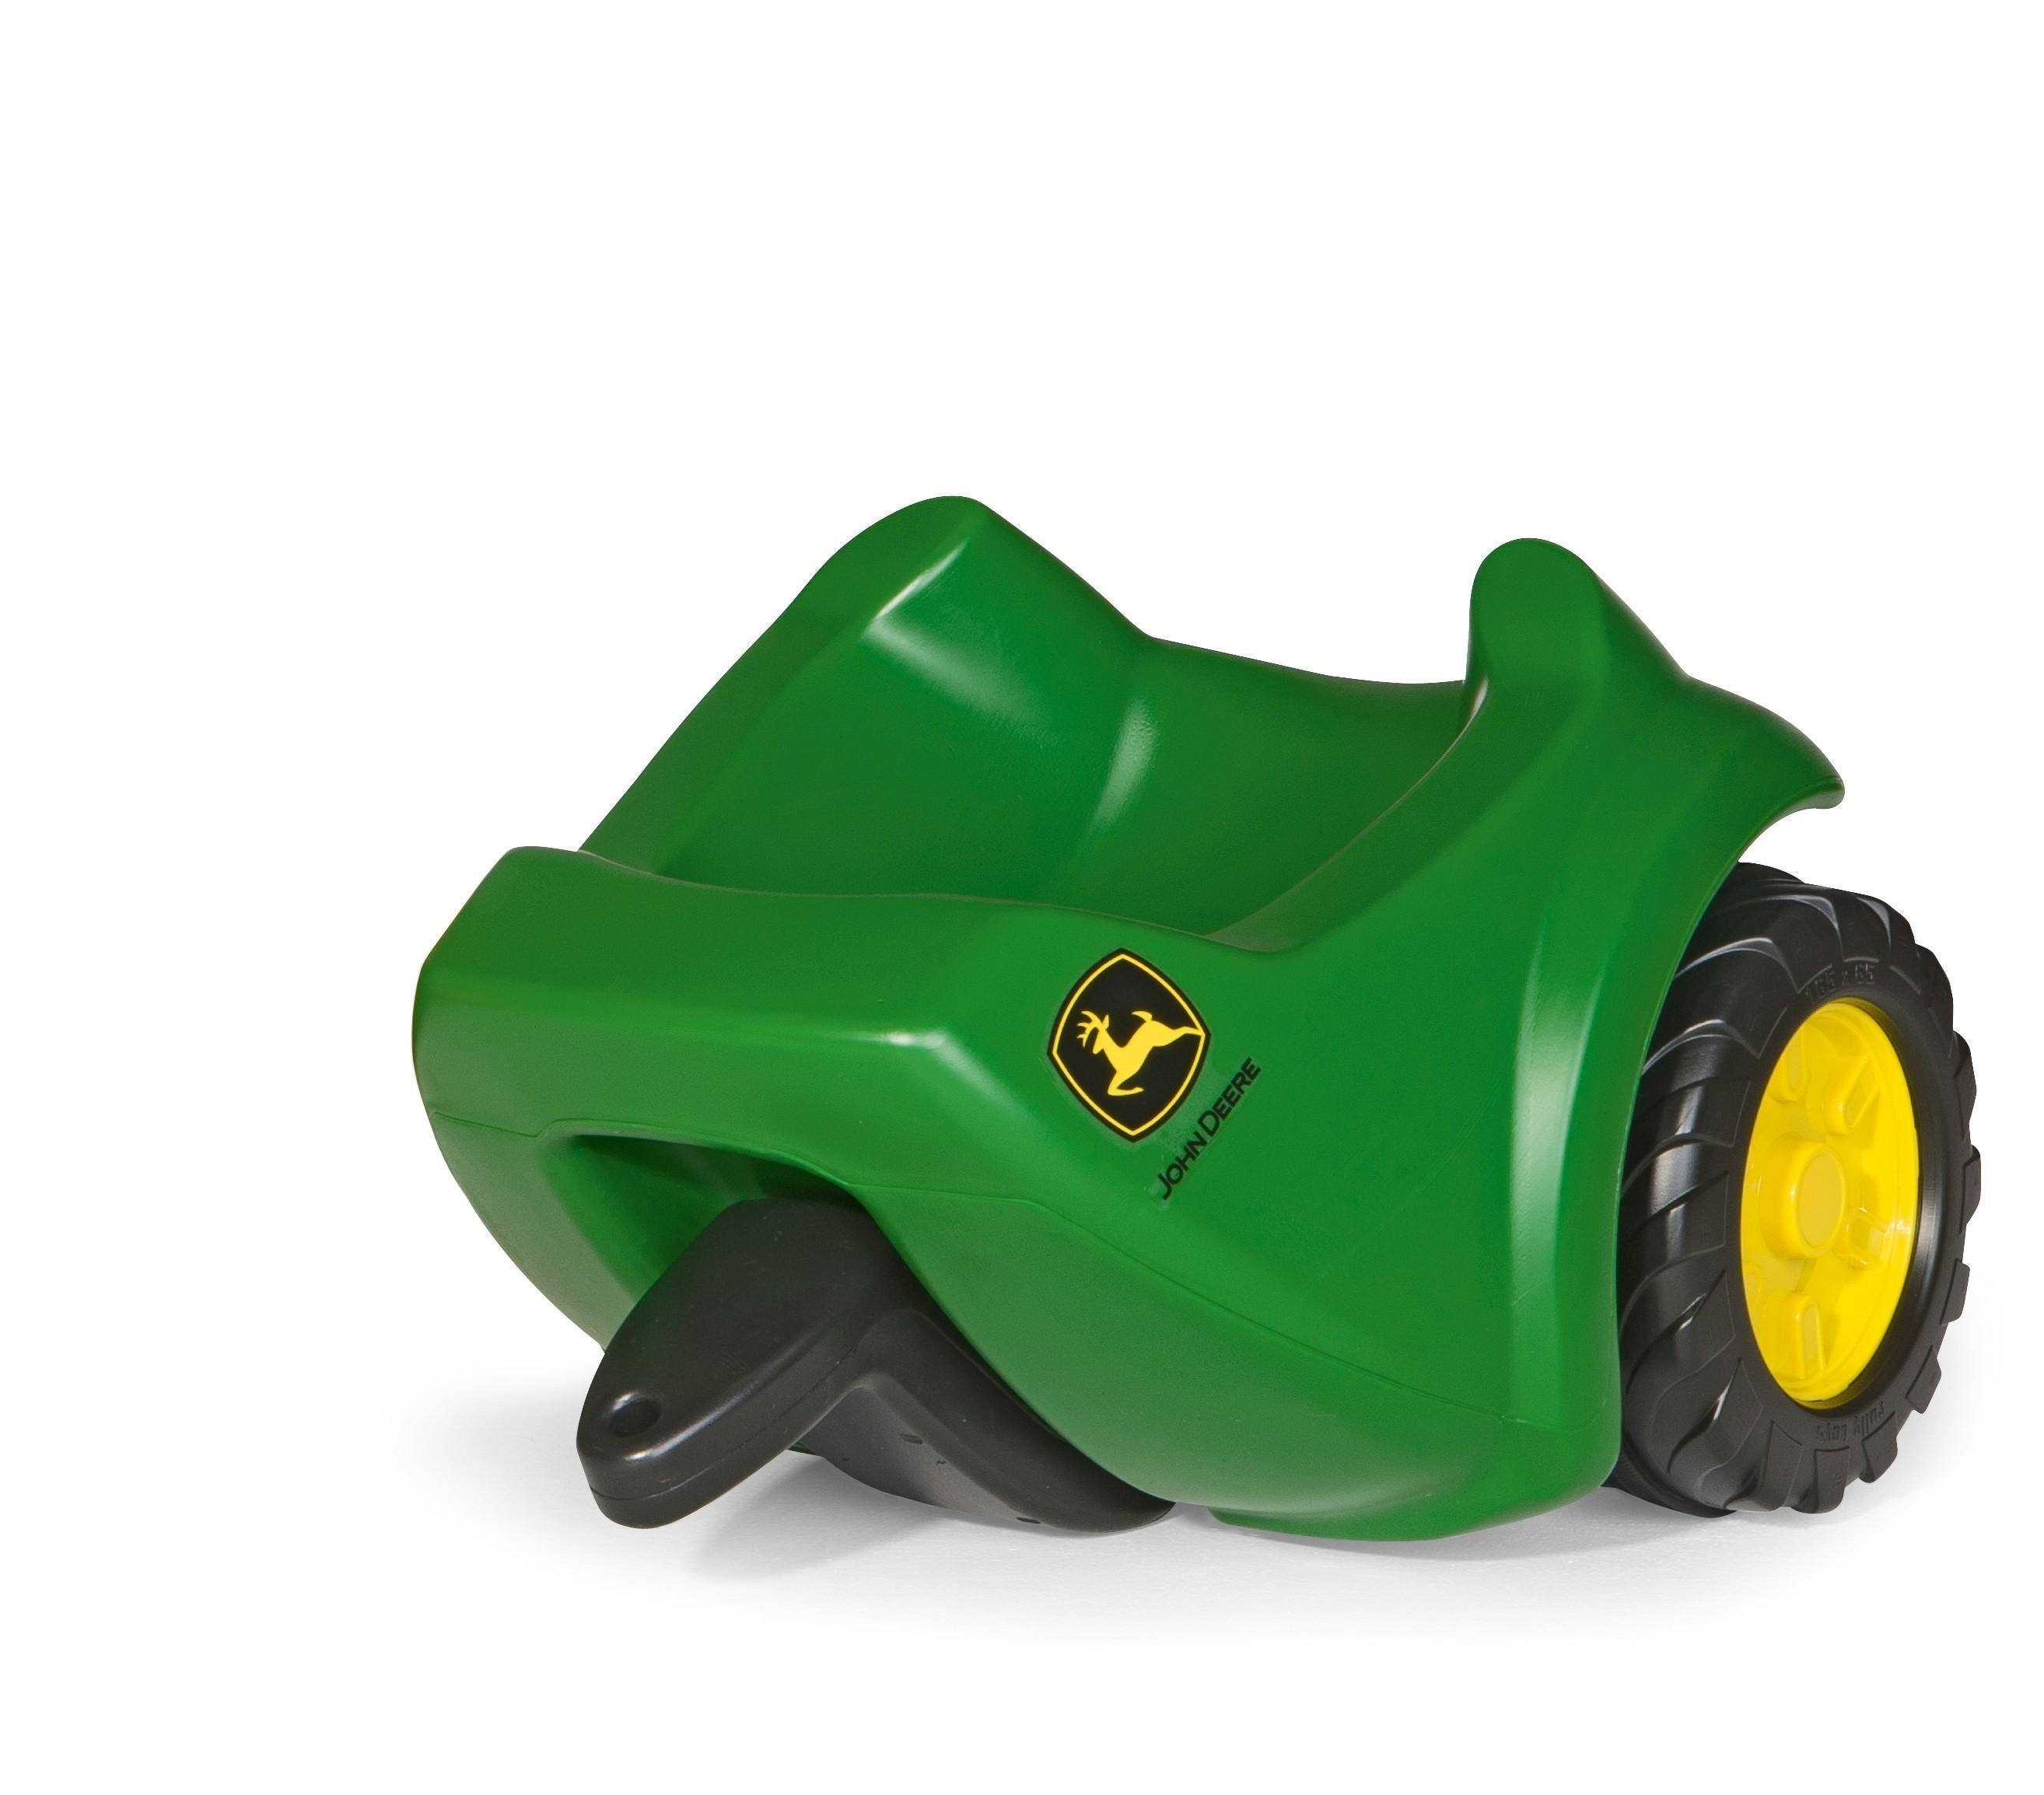 Anhänger für Rutscher rolly Minitrac John Deere Trailer JD Rolly Toys Bild 1